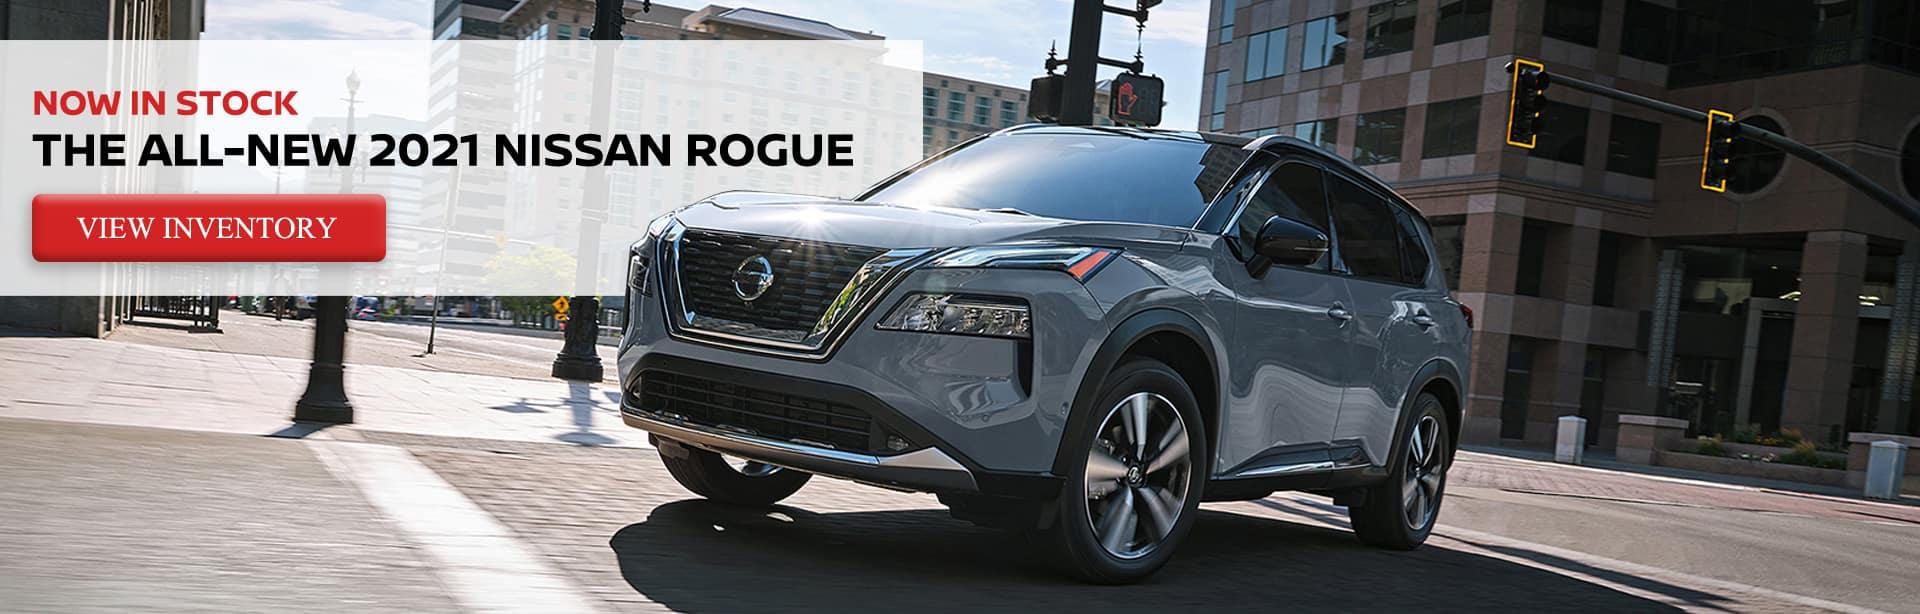 2021-Nissan-Rogue_Nov20